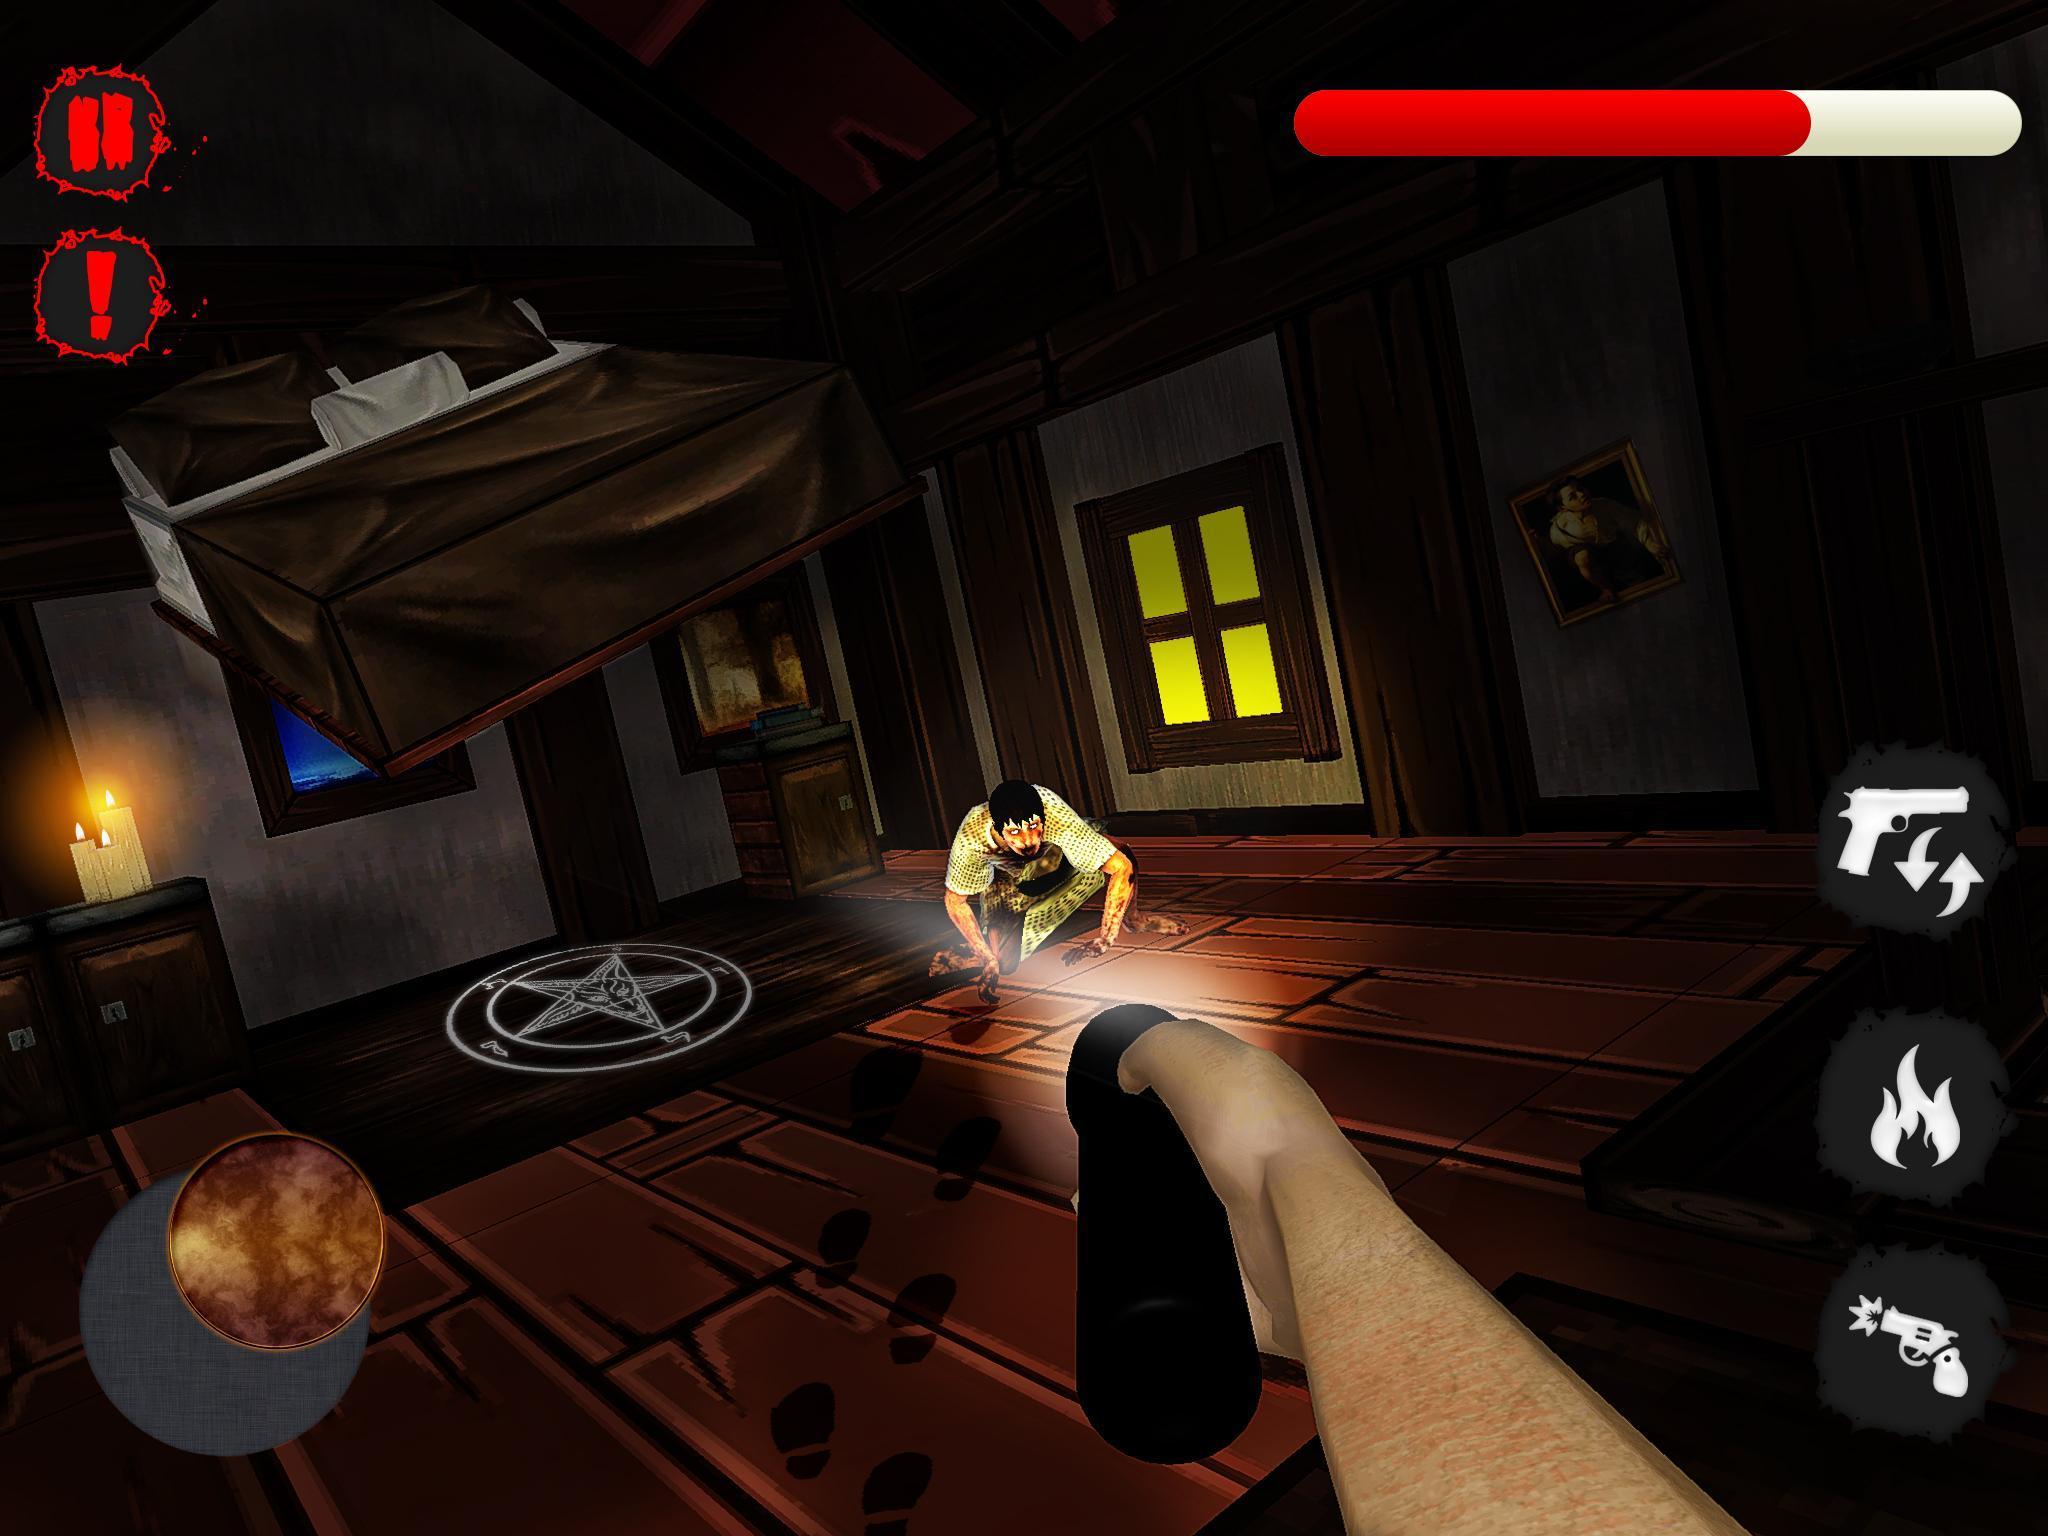 Evil Ghost Killer for Android - APK Download